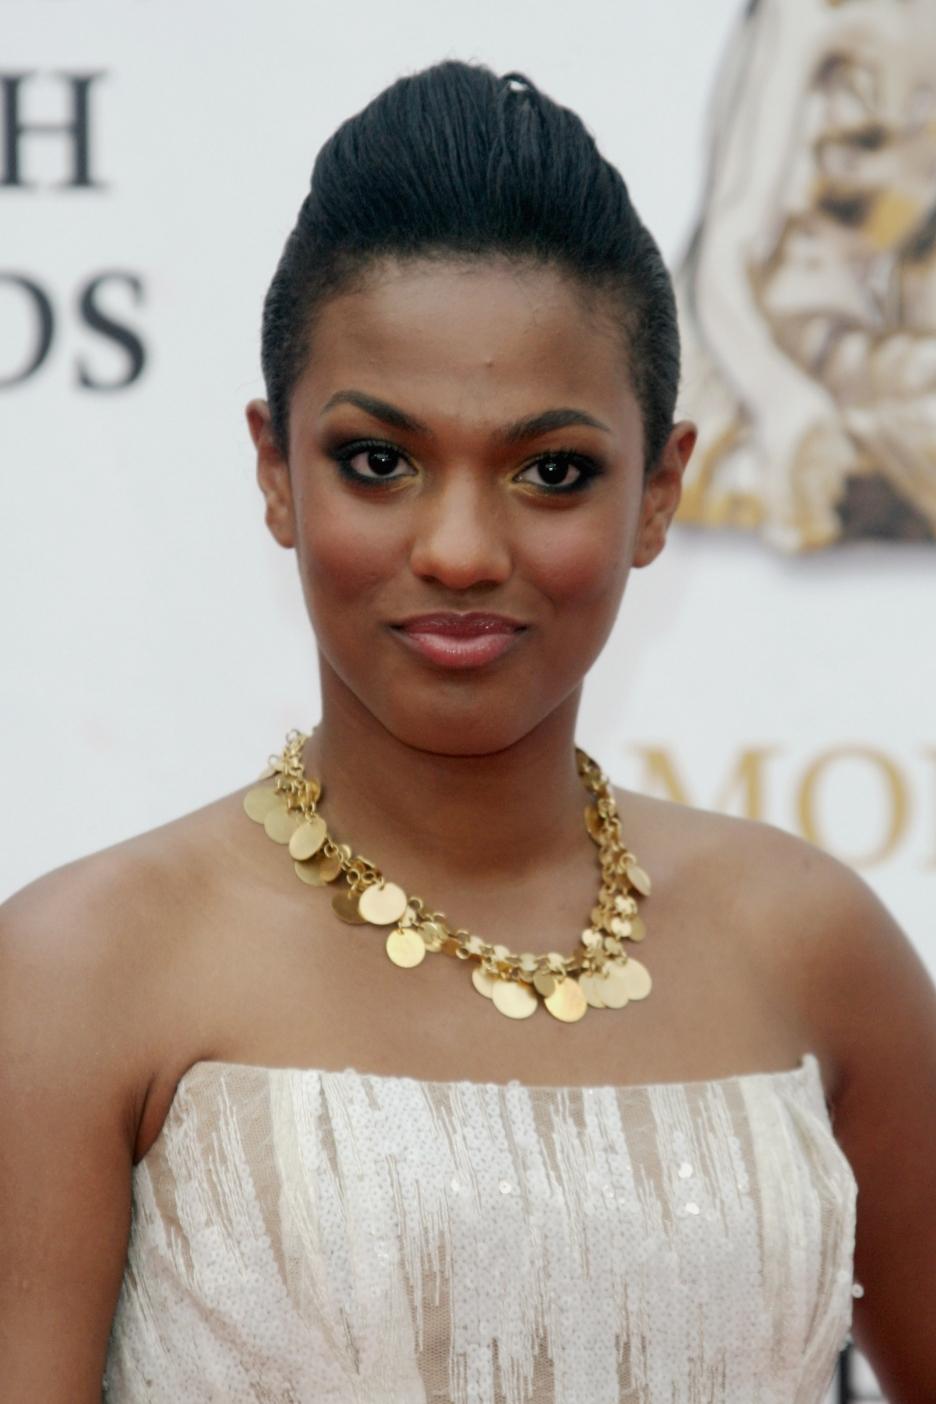 Ghana Rising: The Most Beautiful Women of Ghanaian Origin 2012